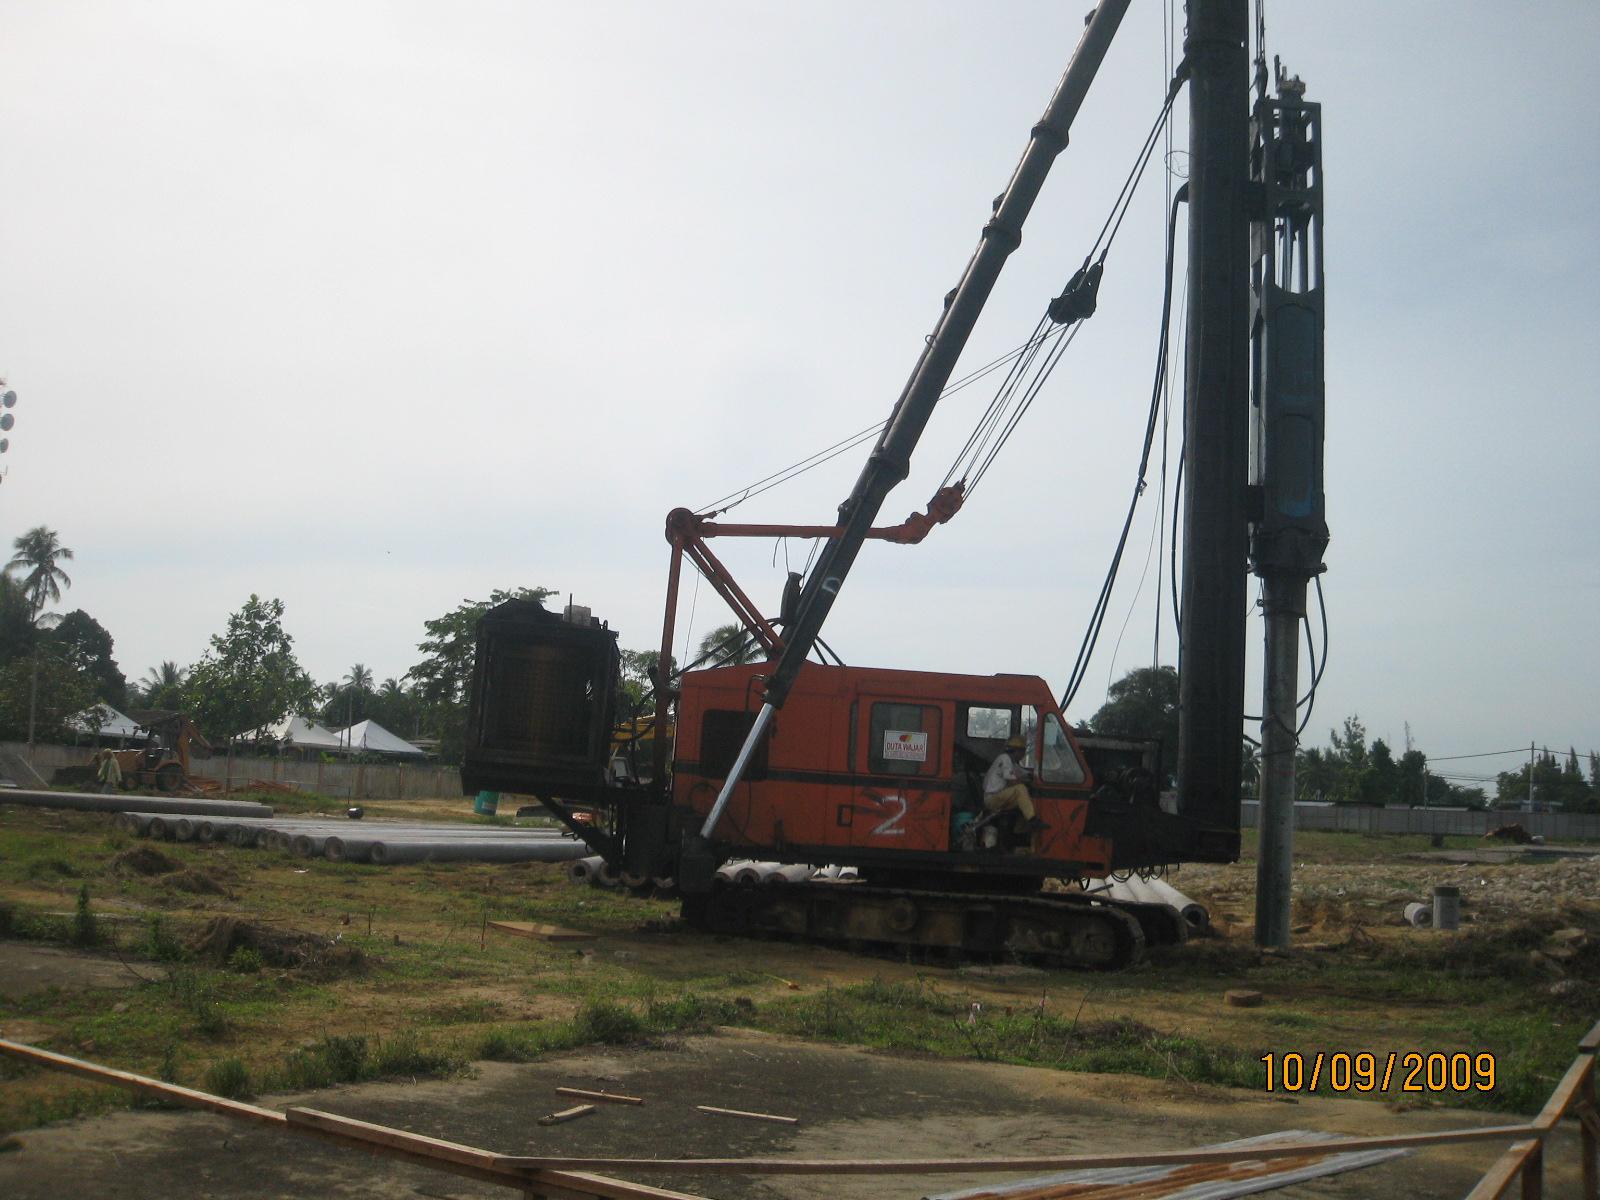 ... Daerah Bachok): Mendirikan Papan tanda Pembinaan& Lain2 Kerja